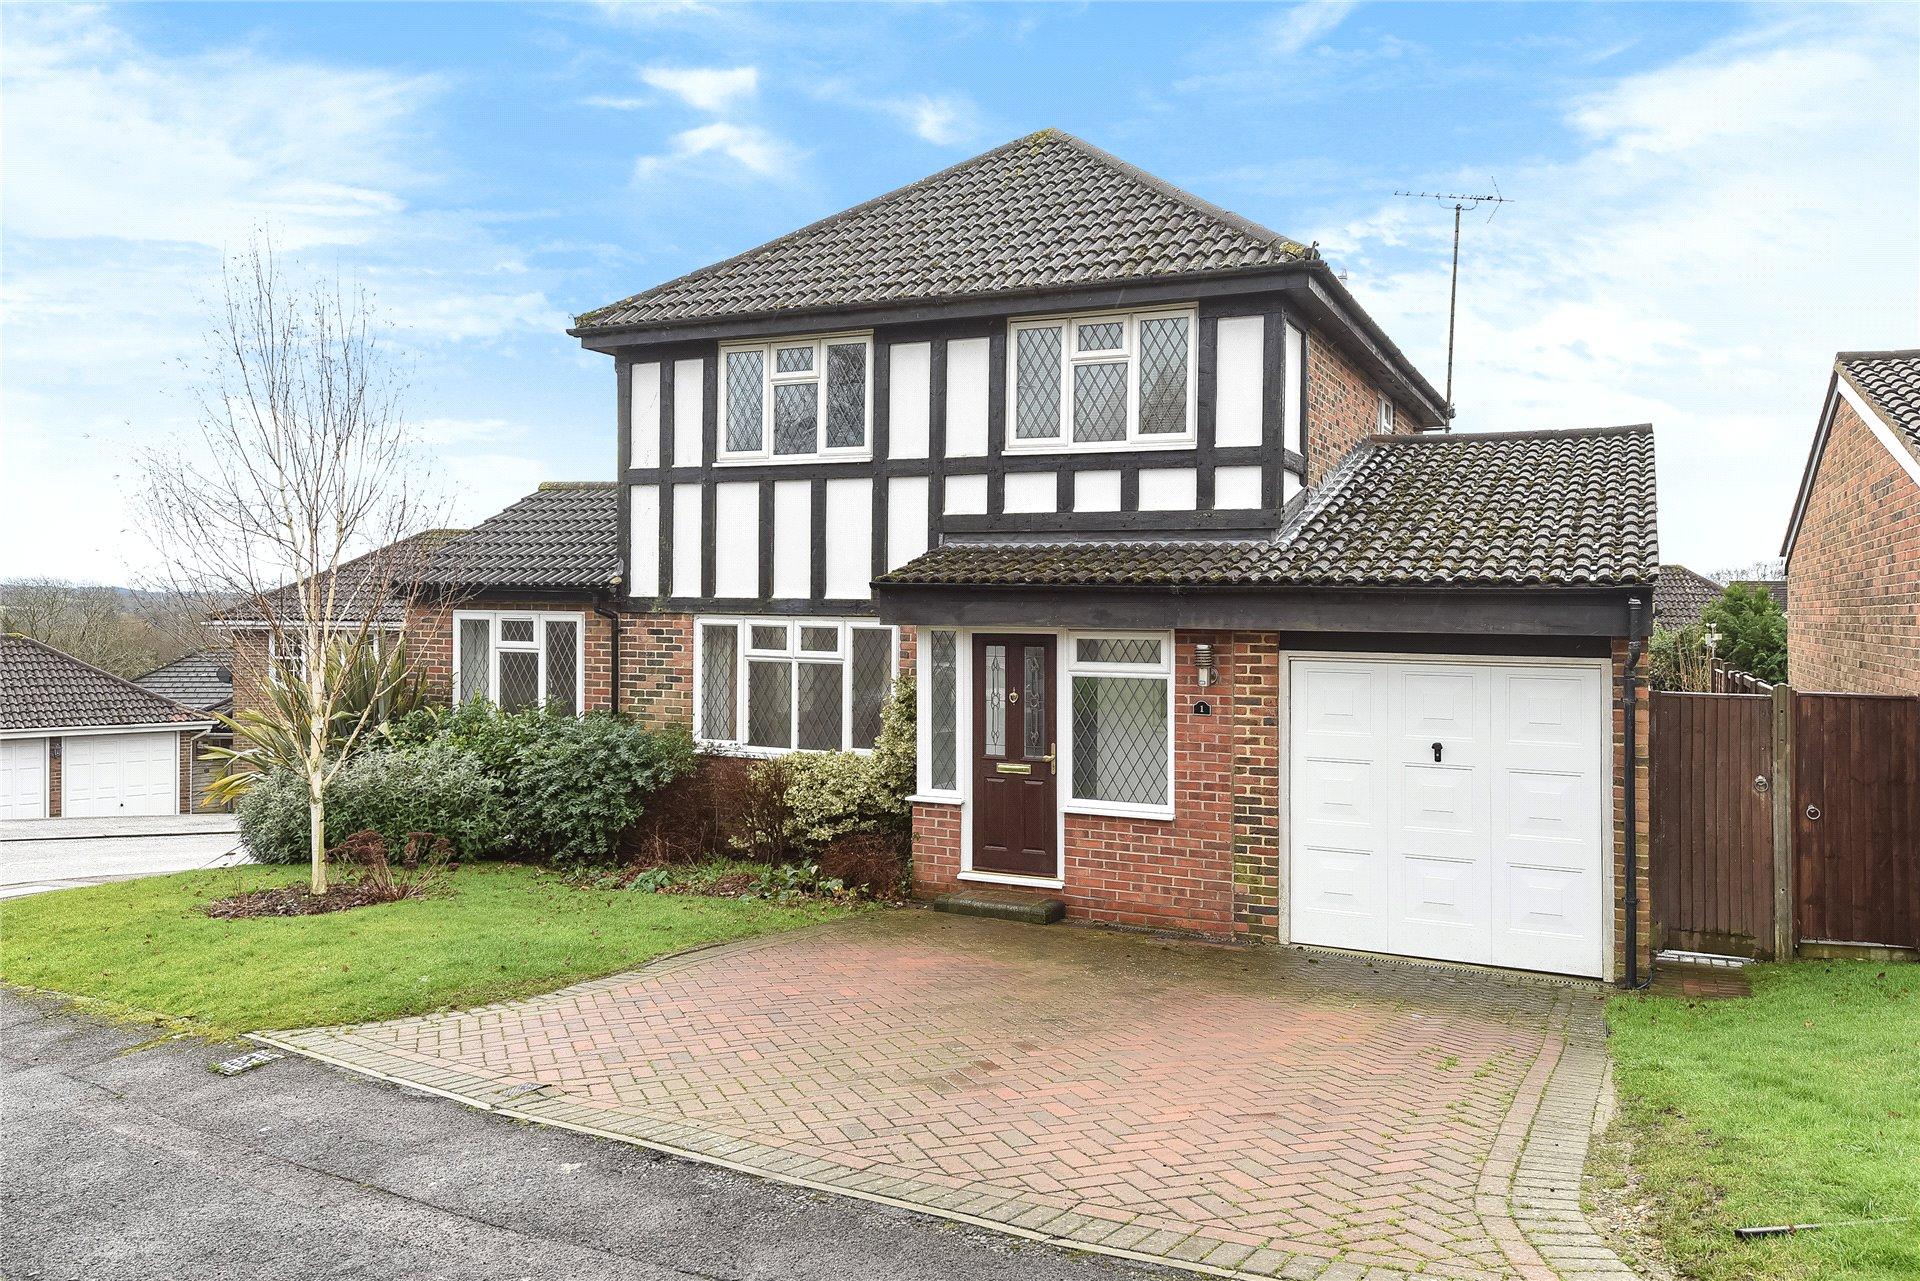 4 Bedrooms Detached House for sale in Melksham Close, Lower Earley, Reading, Berkshire, RG6